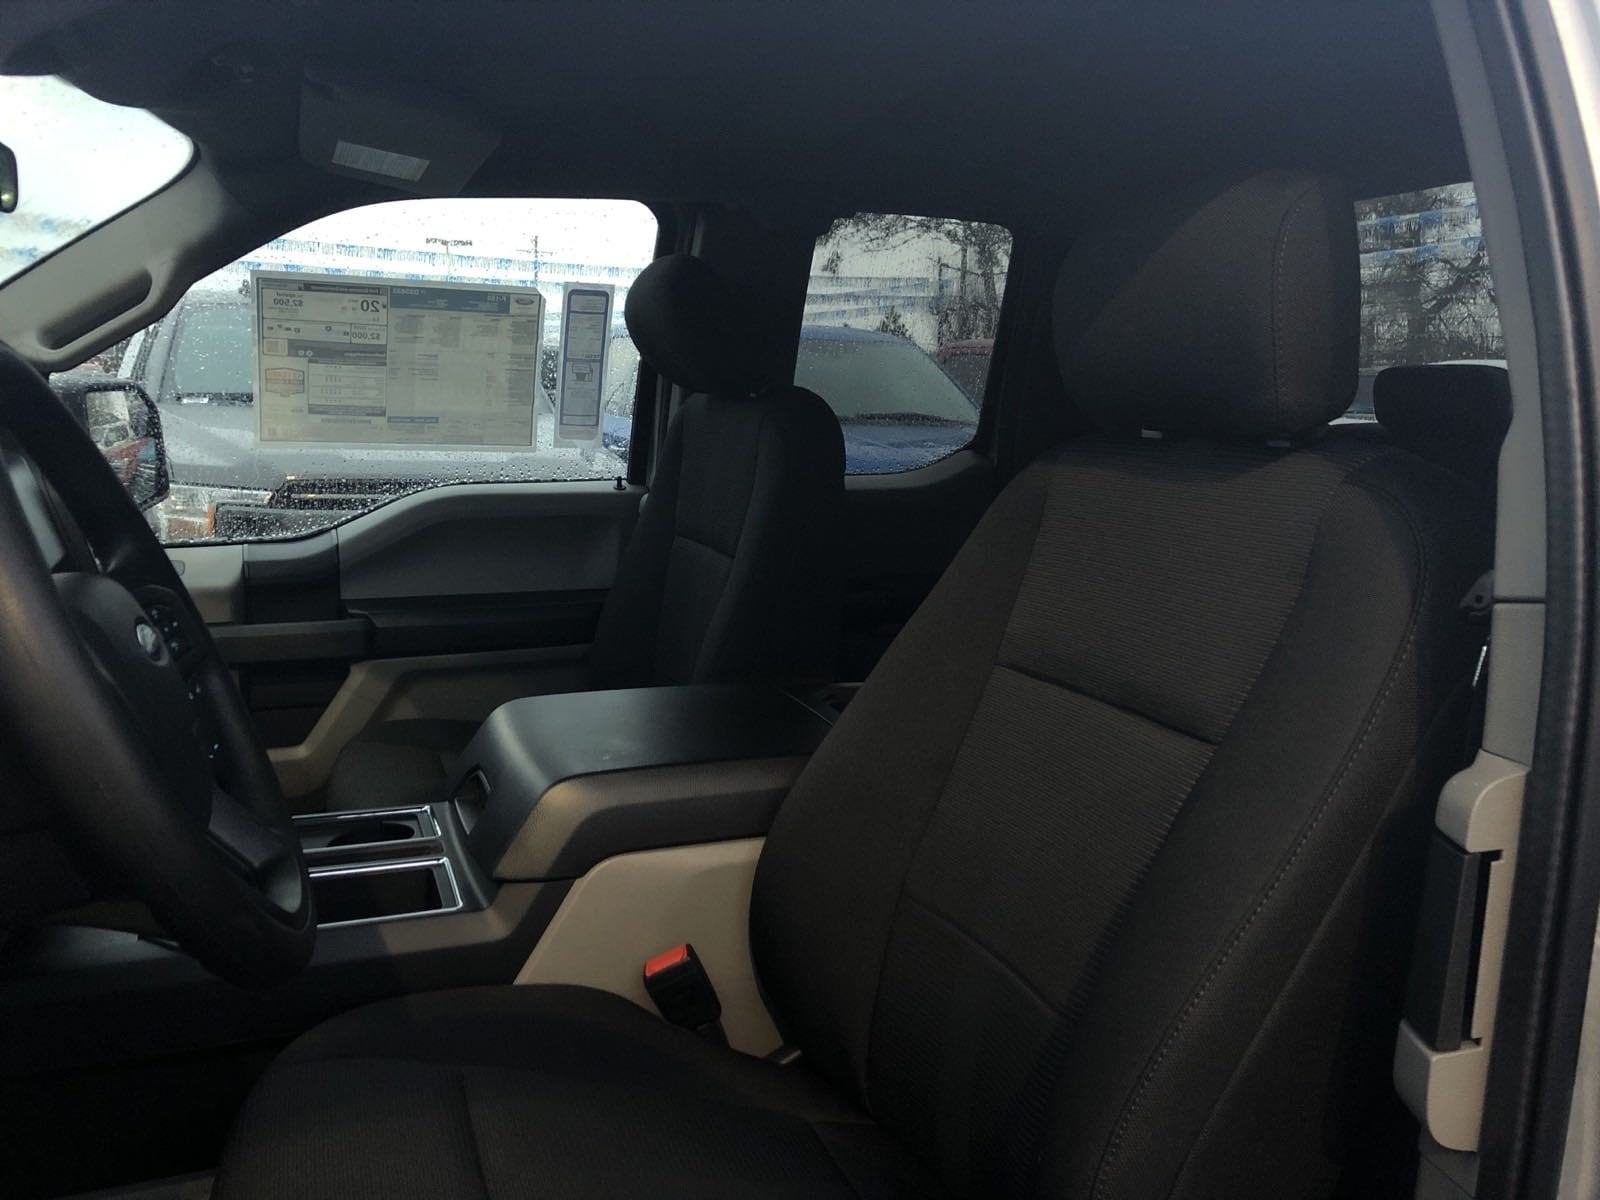 2020 Ford F-150 Super Cab 4x4, Pickup #209337 - photo 1